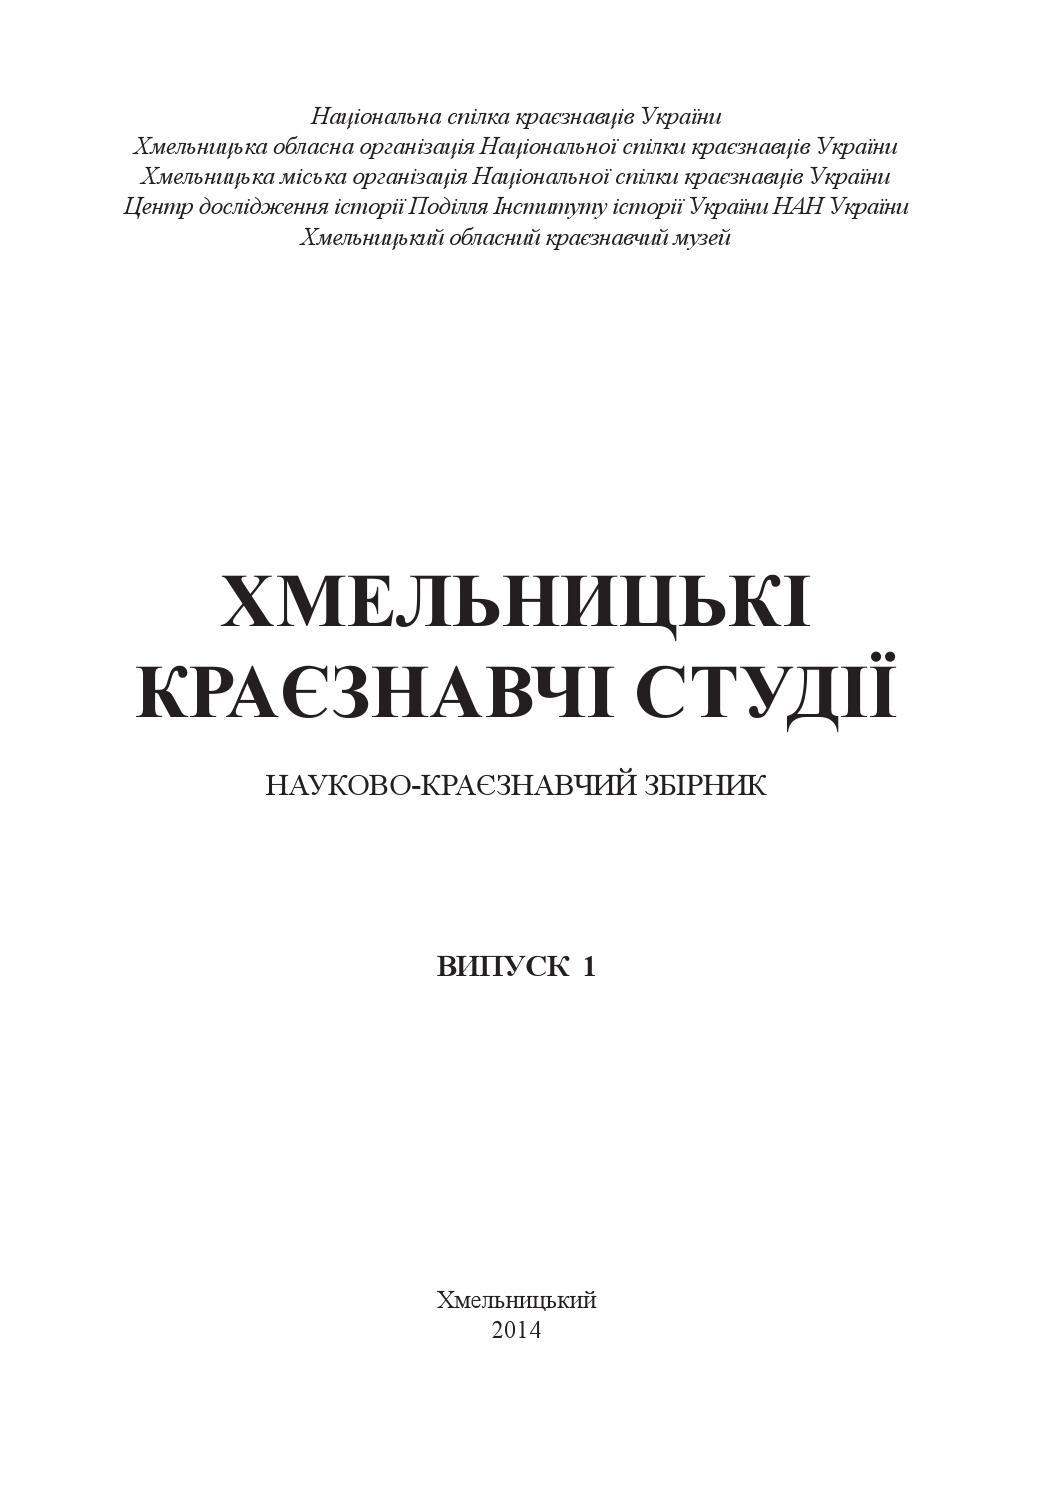 Хмельницькі краєзнавчі студії. Випуск 1 by kminfo - issuu cd5888dc740fd